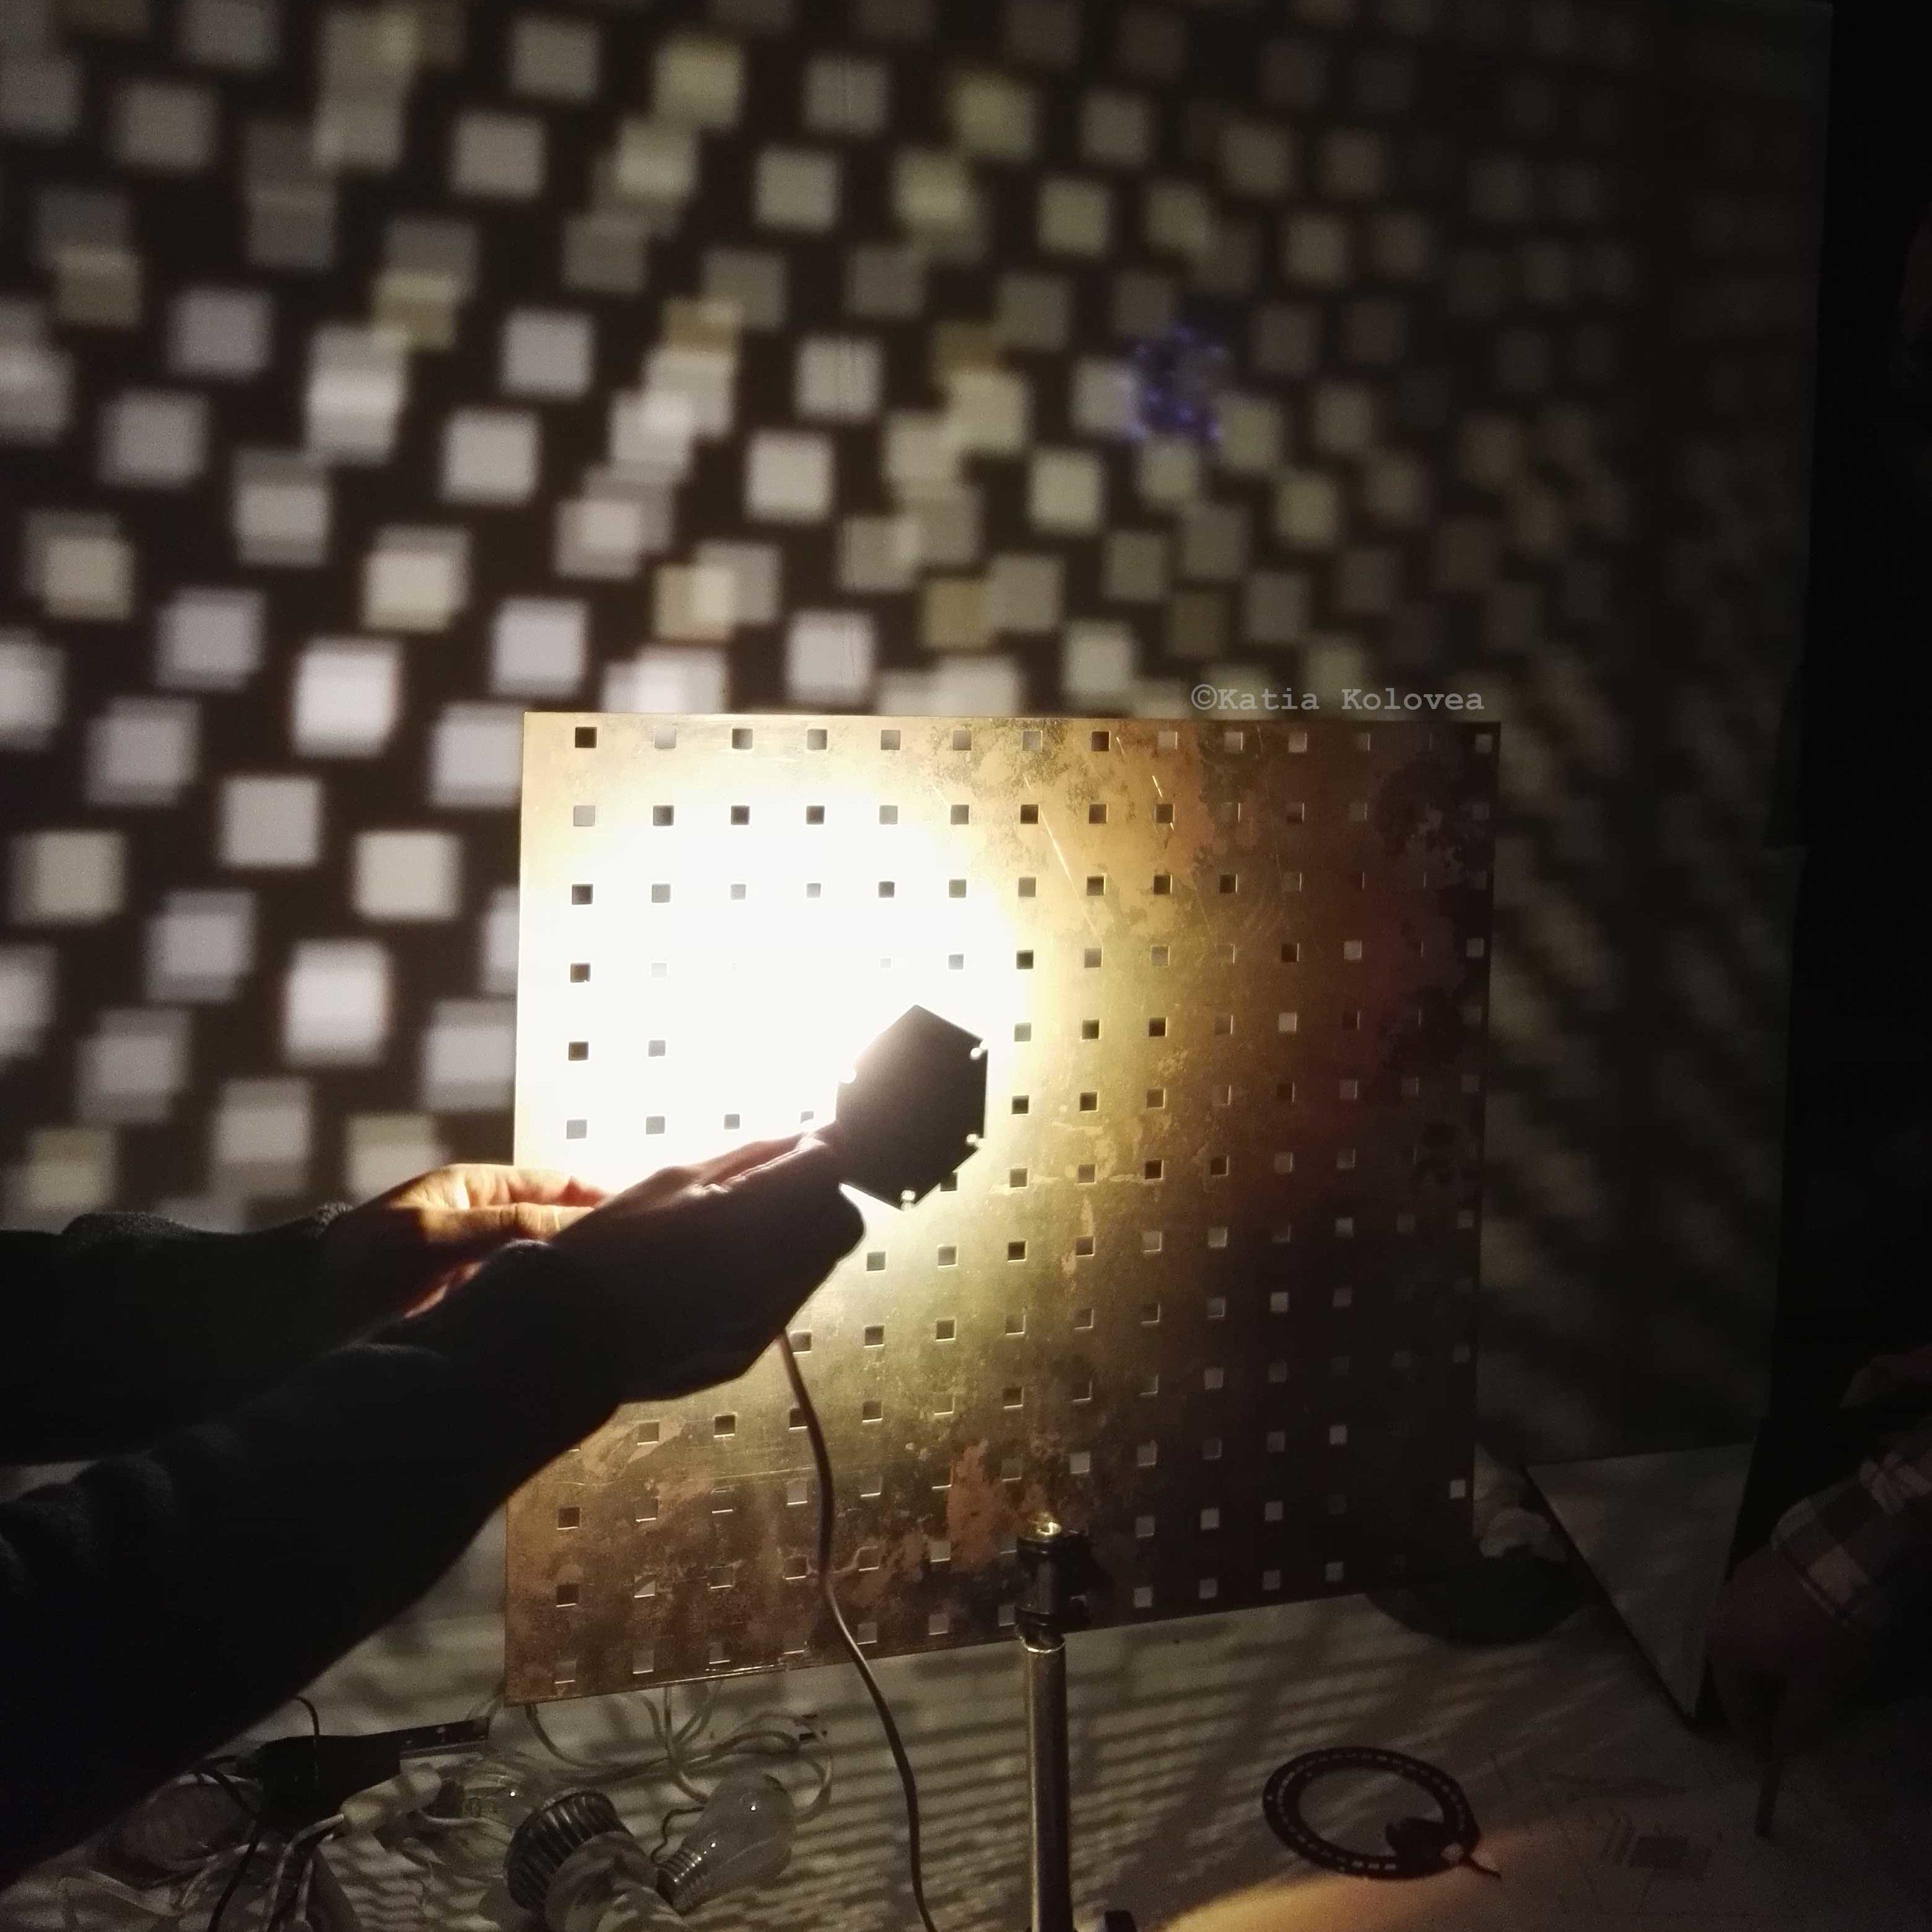 KTH Lighting Laboratory project